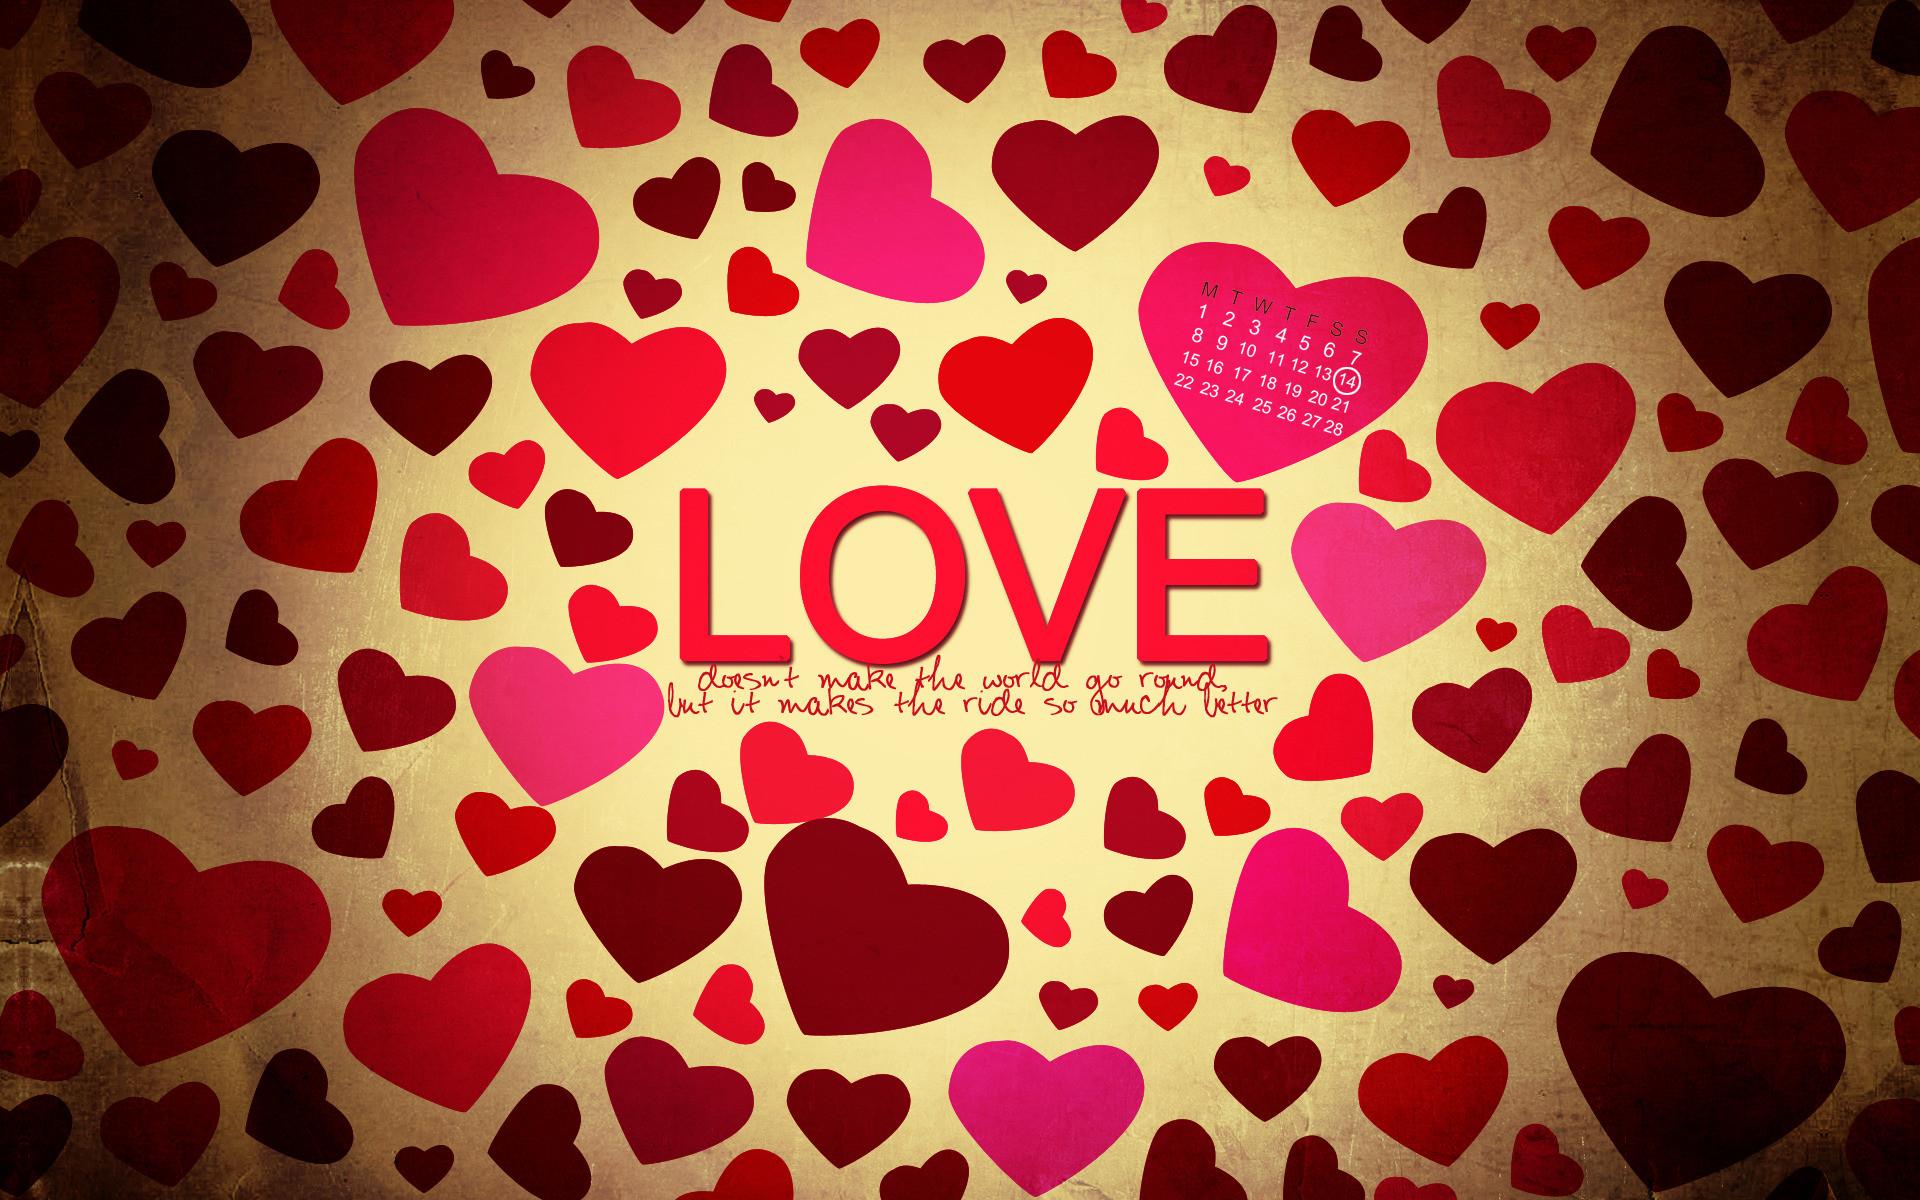 Download: Love – Valentine's Day HD Wallpaper